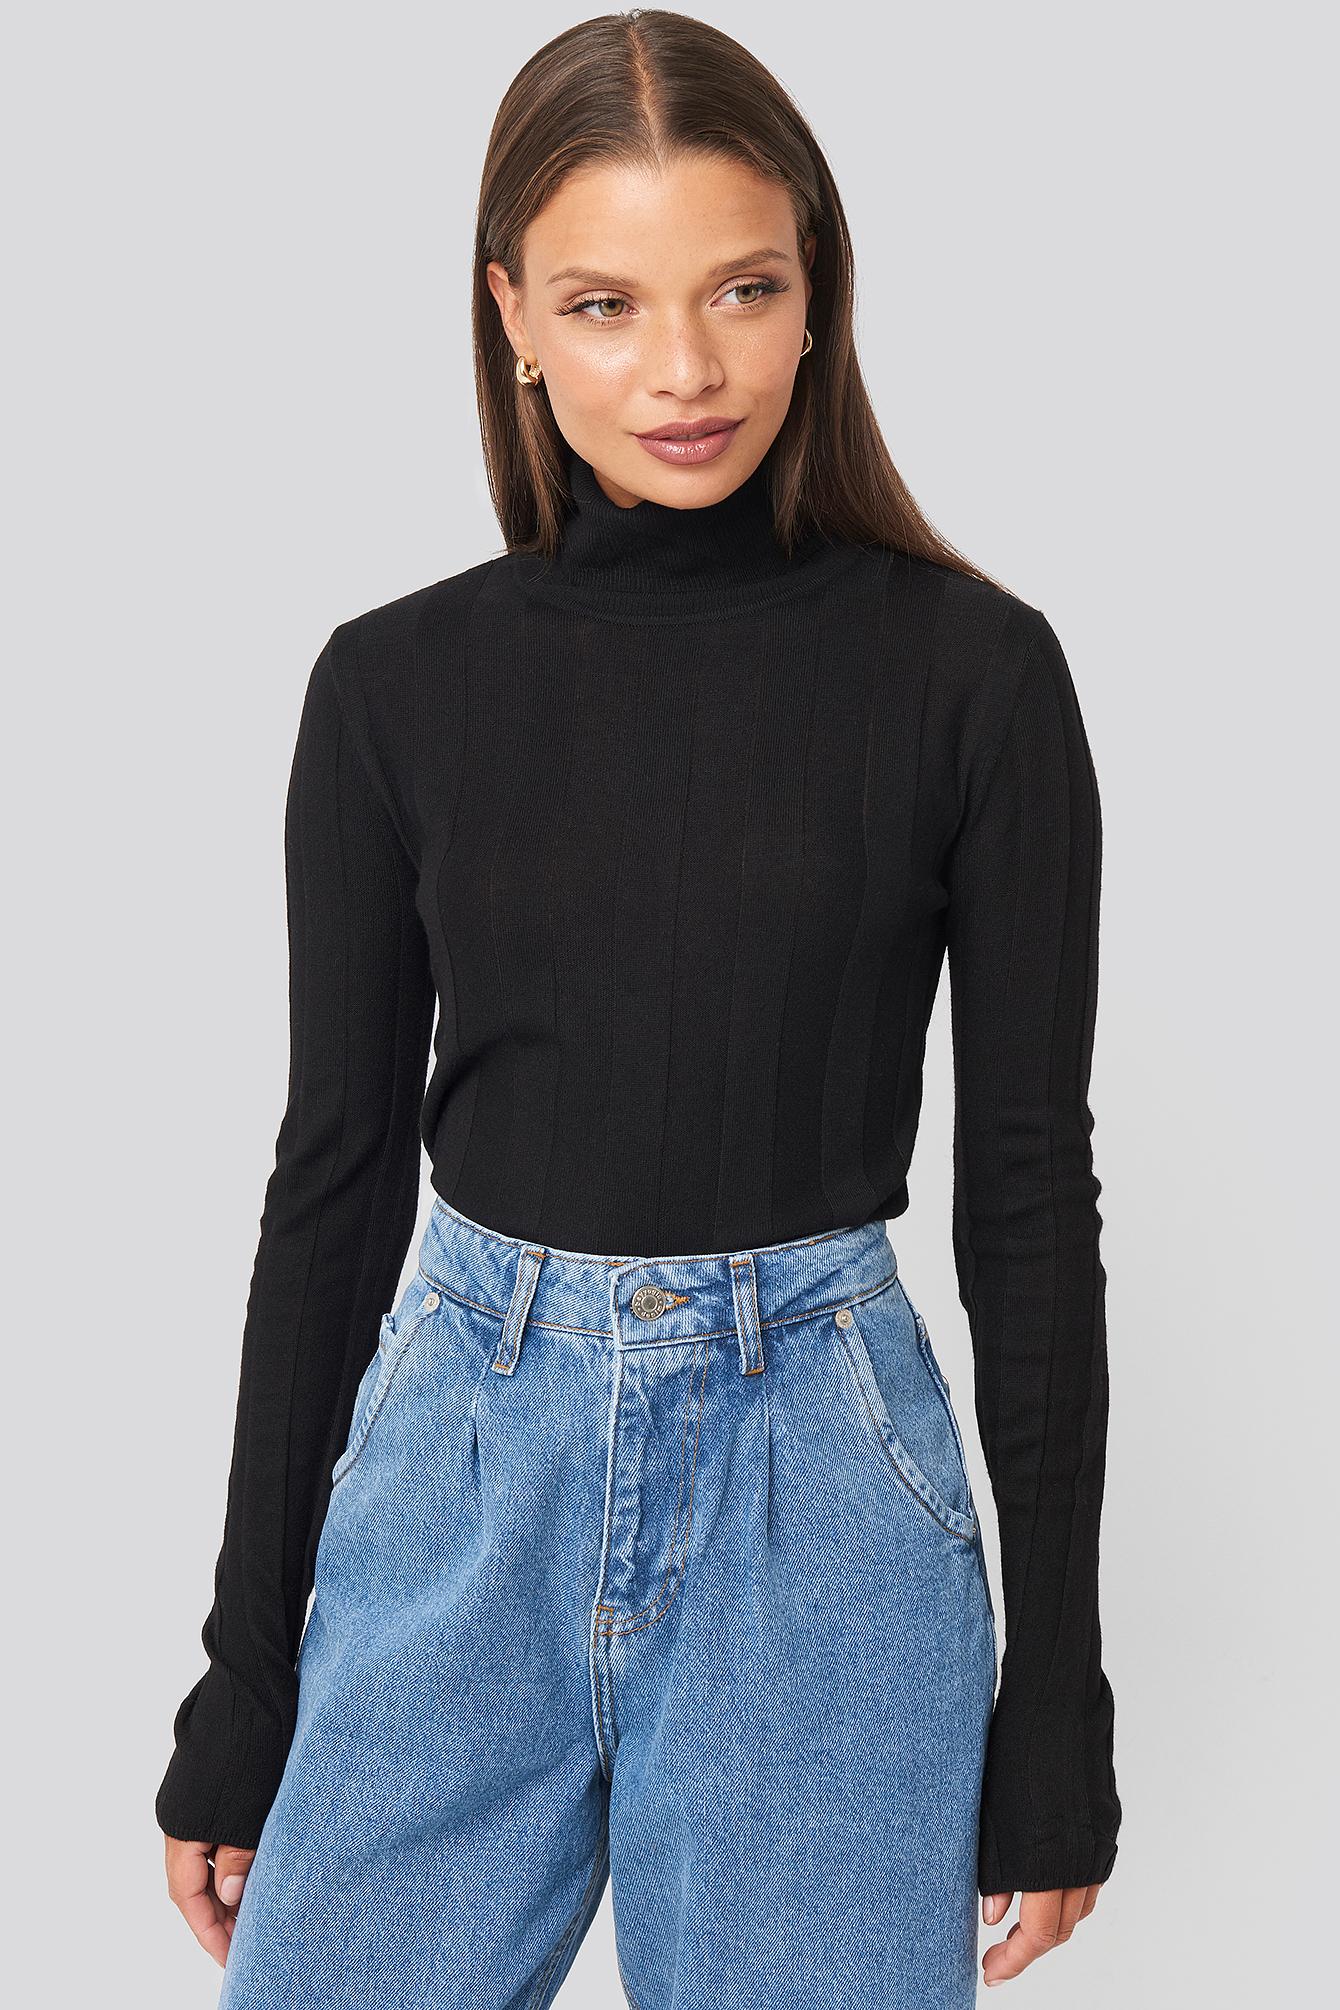 genovac-sweater-black by mango